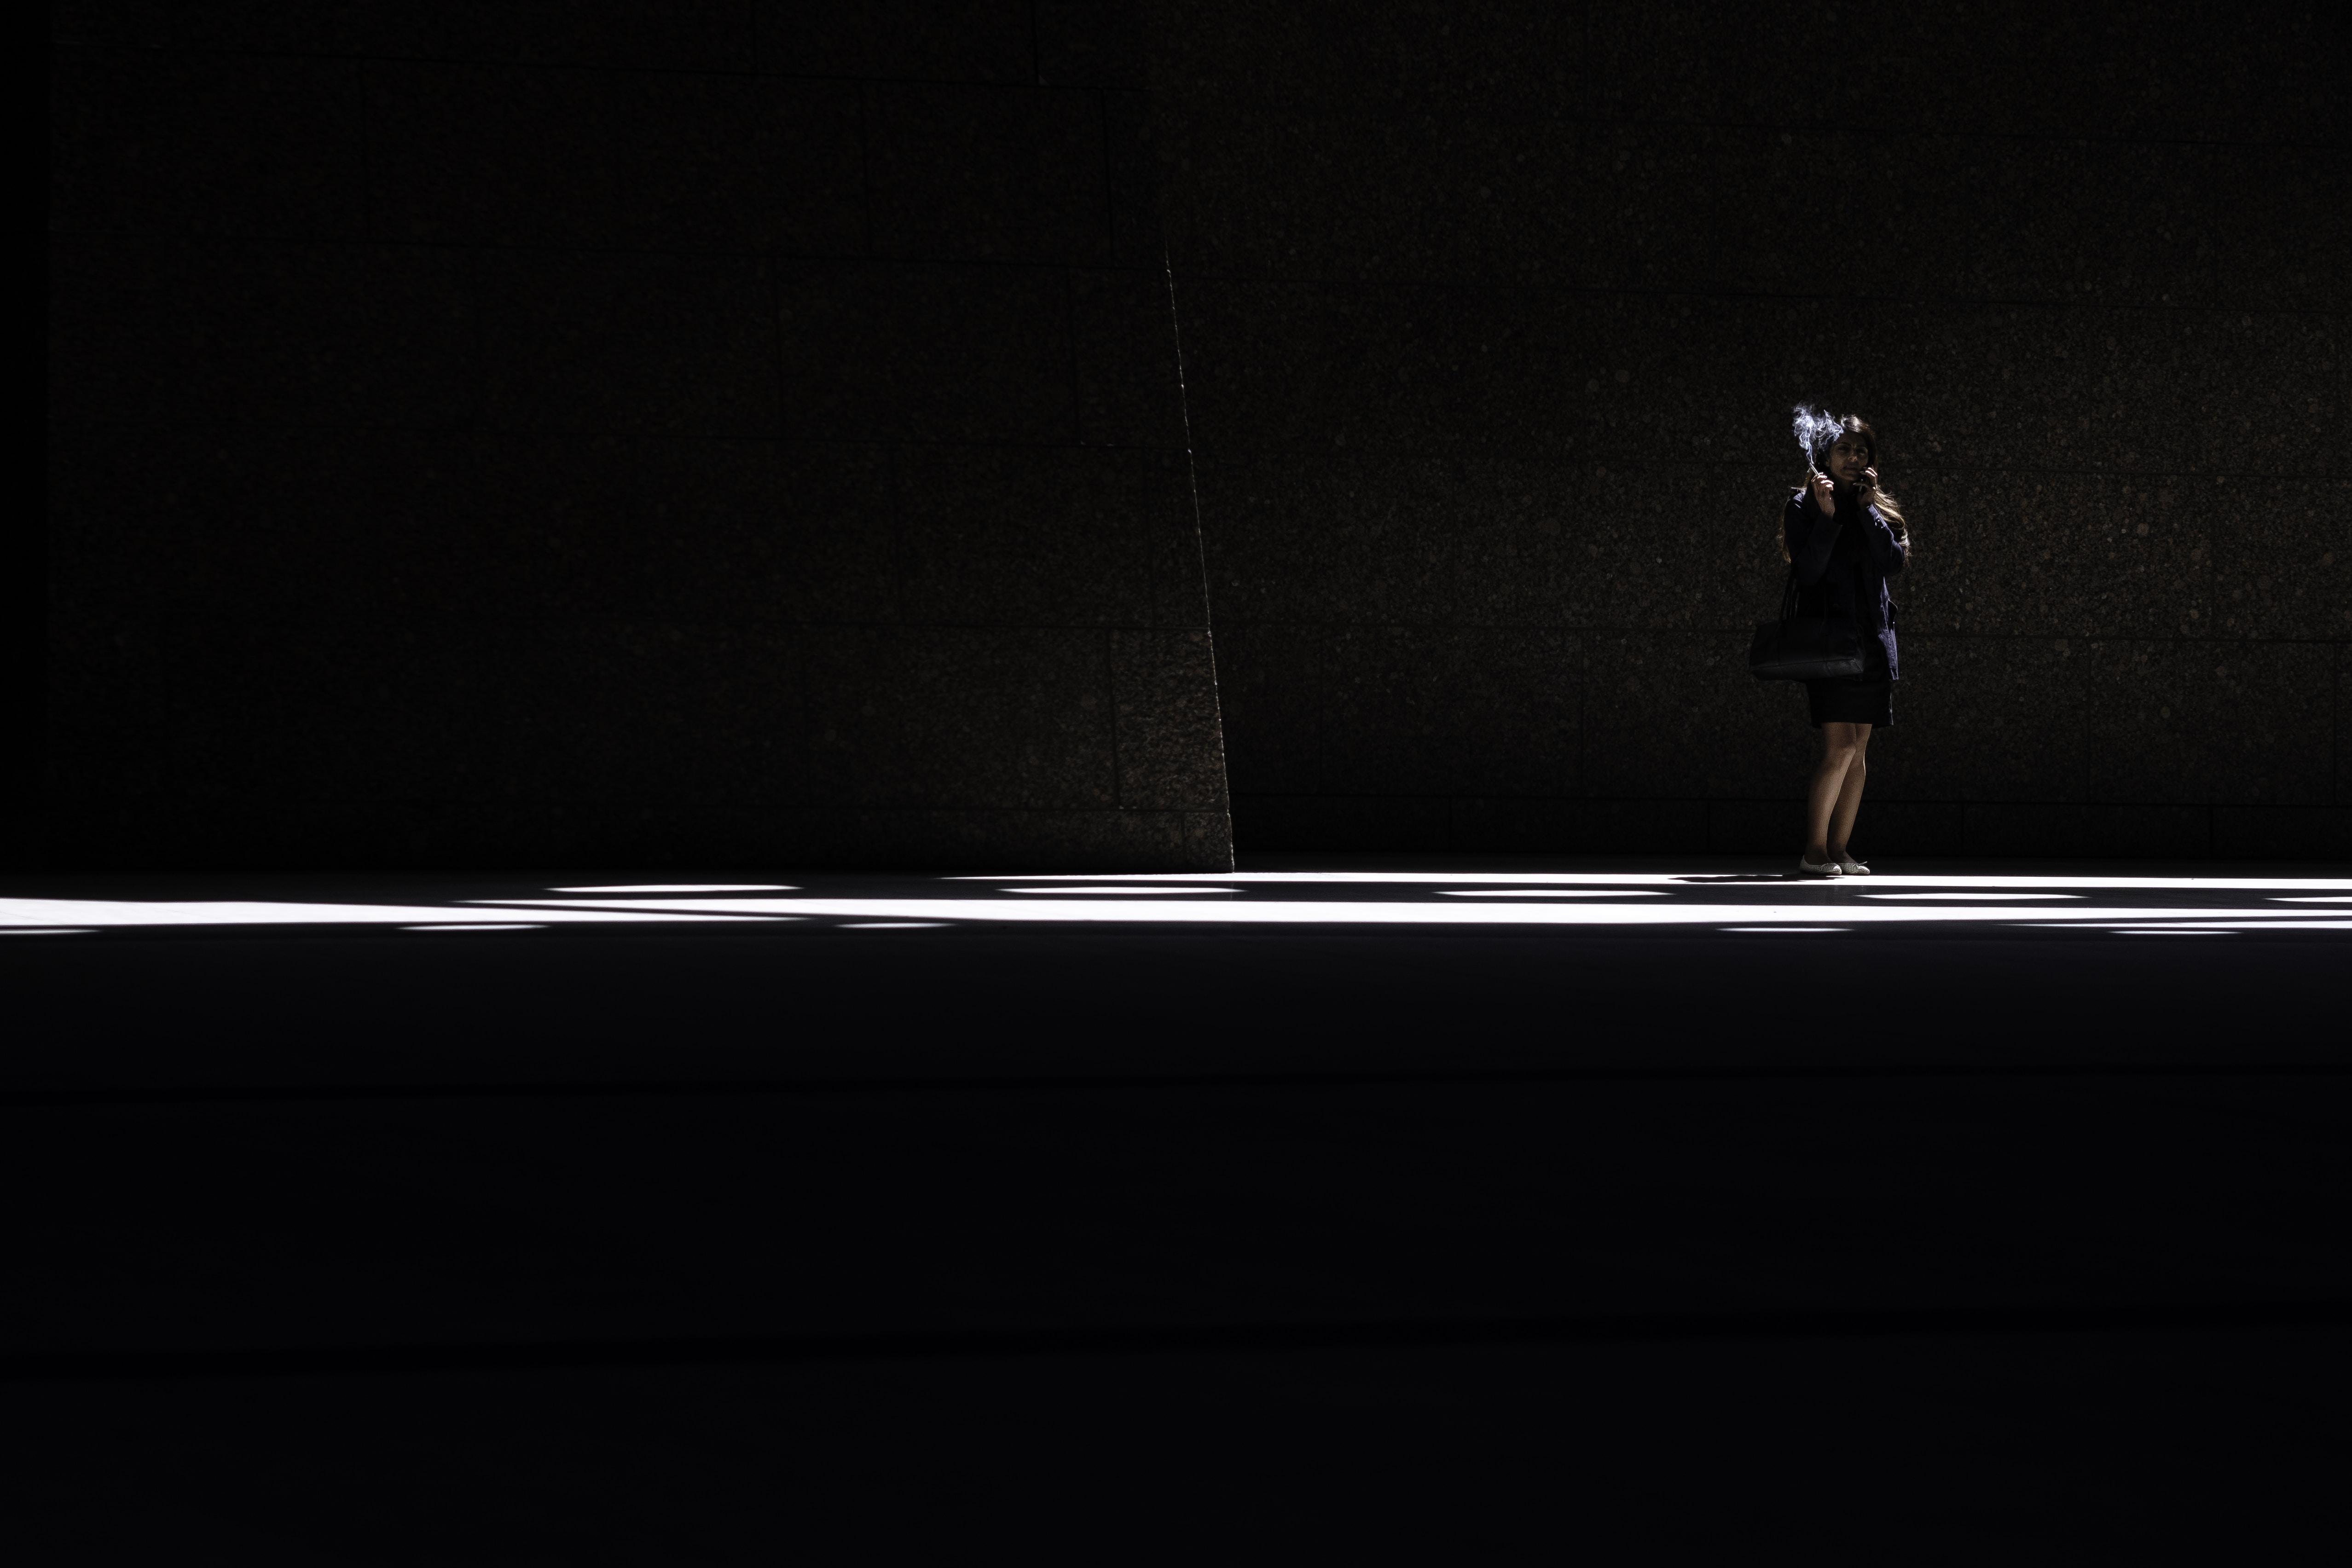 woman wearing black skirt